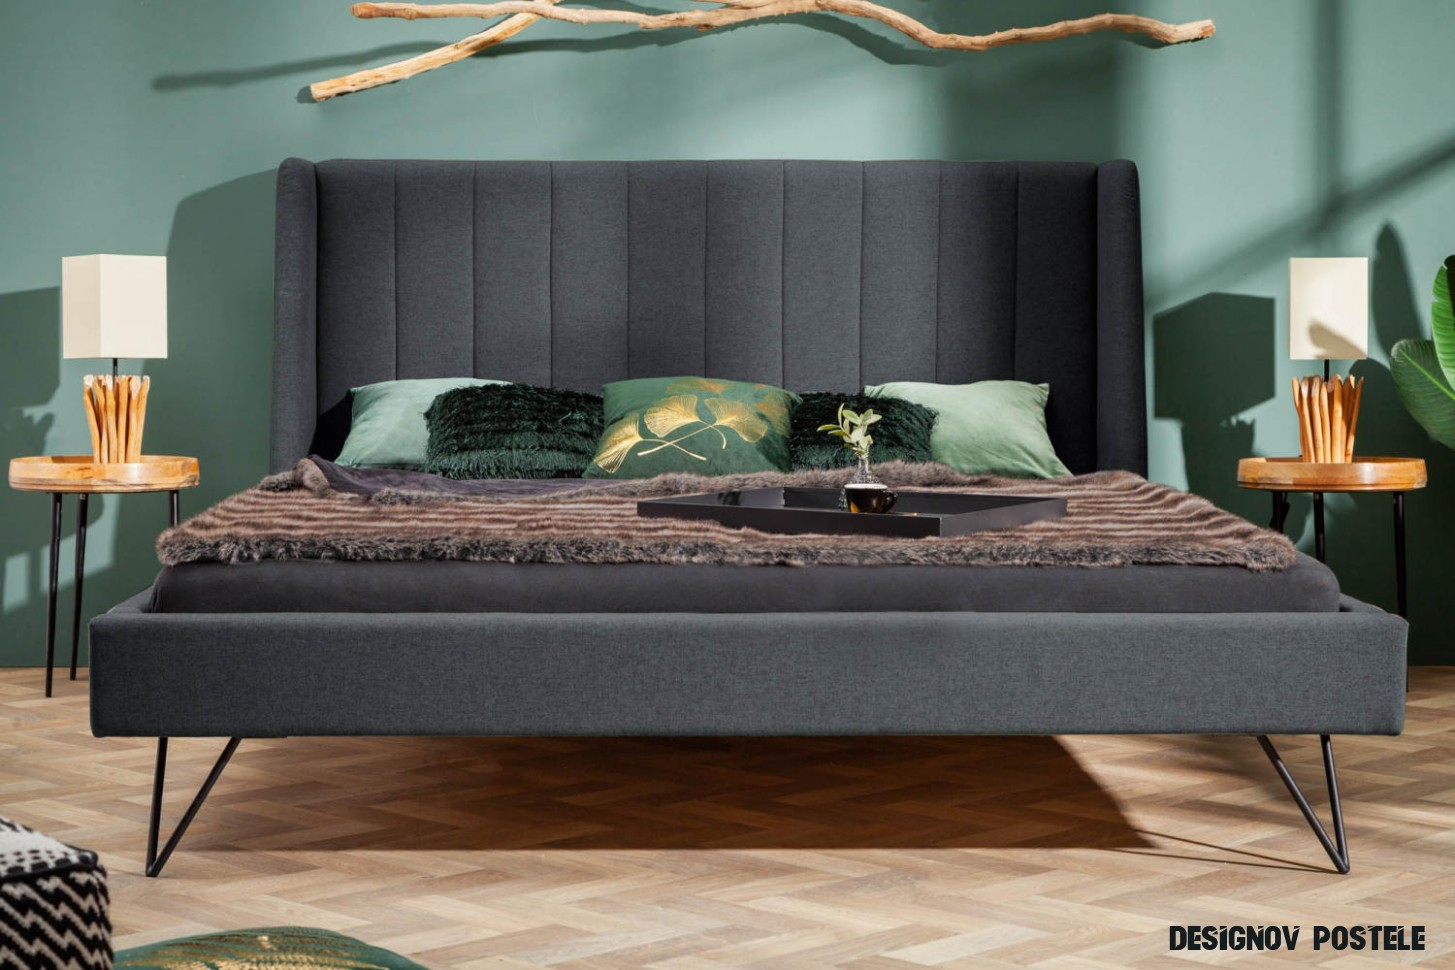 Designová postel Phoenix 18 x 18 cm antracit